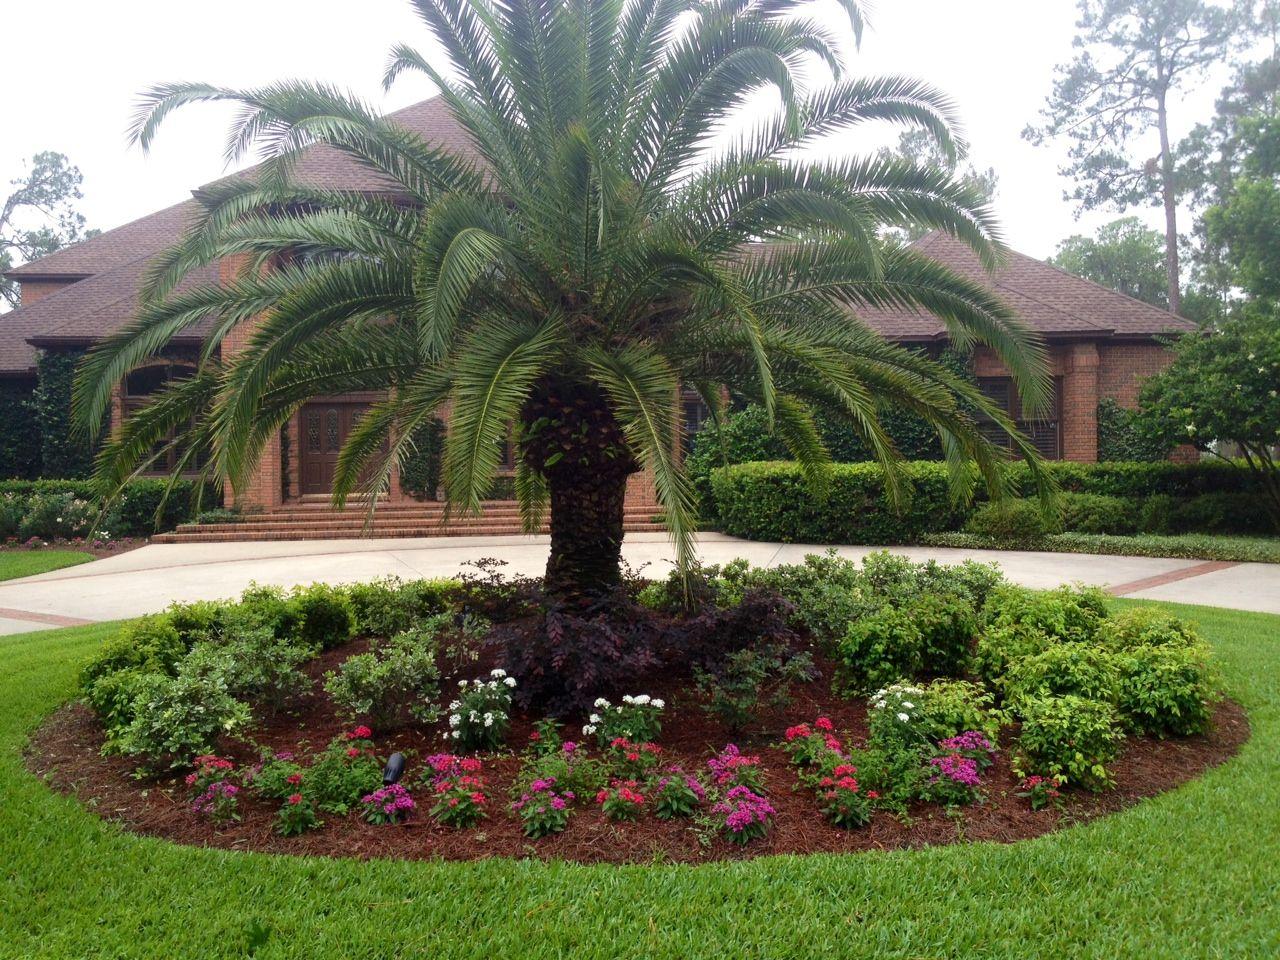 Bathroom Designs Jacksonville Fl in the garden landscape and design jacksonville fl | bathroom